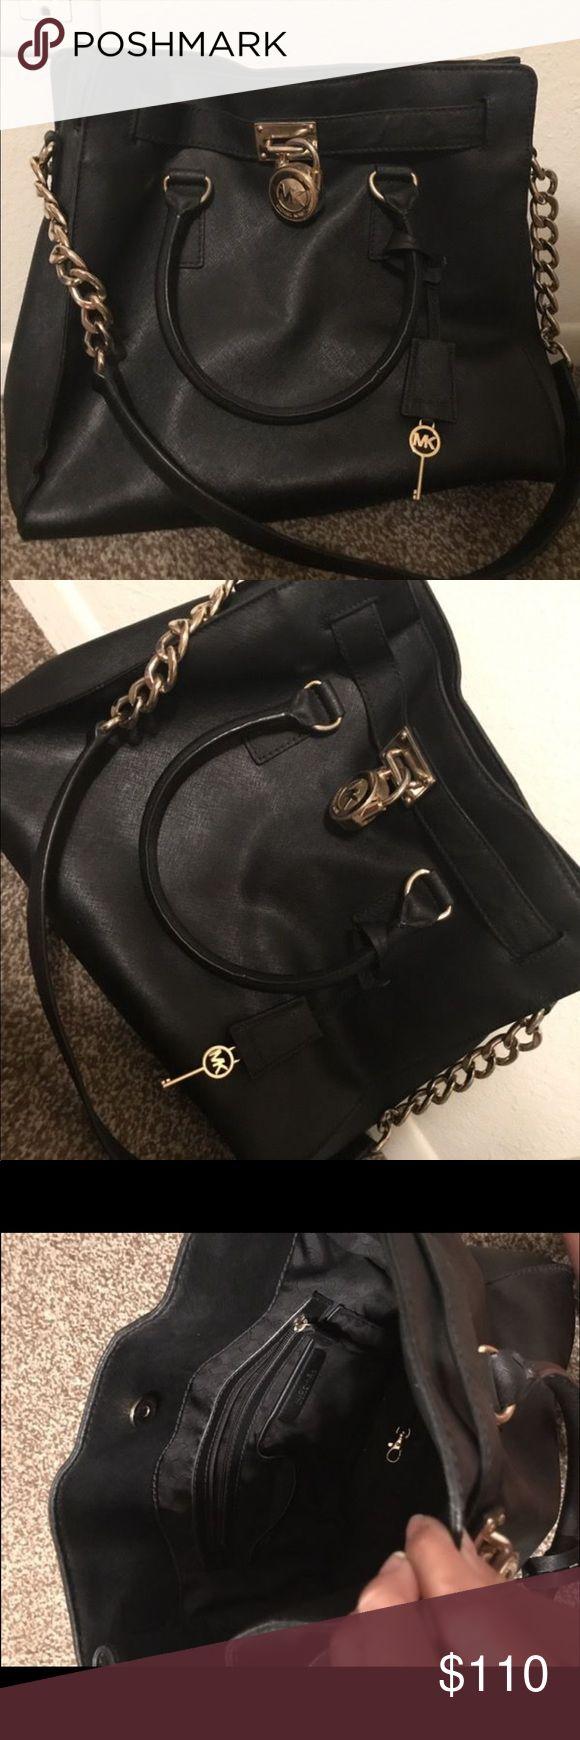 michael kors handbags authentic used michael kors hamilton black purse with silver